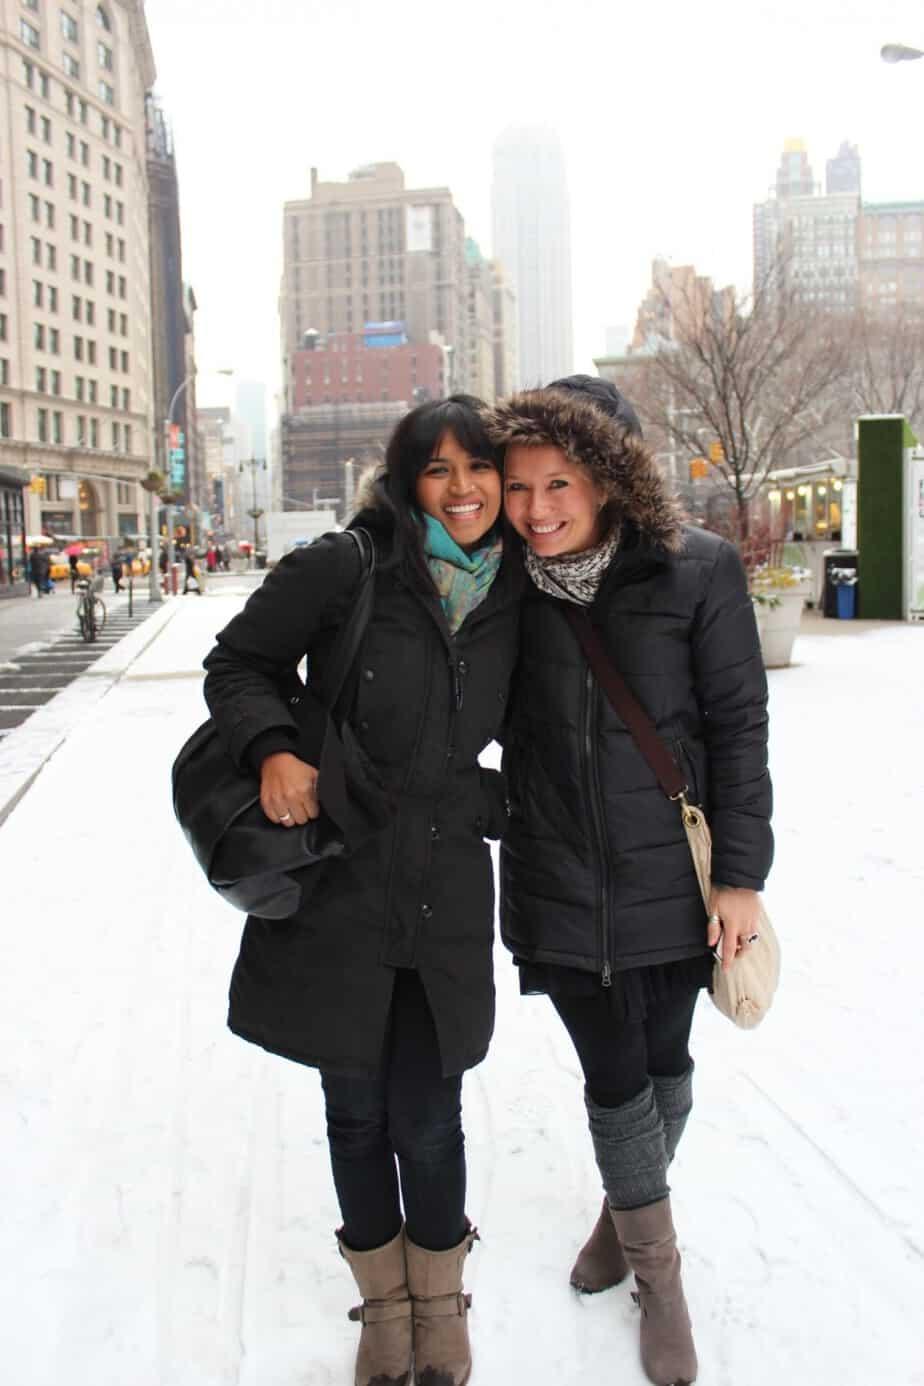 Jenny S and Ritu A